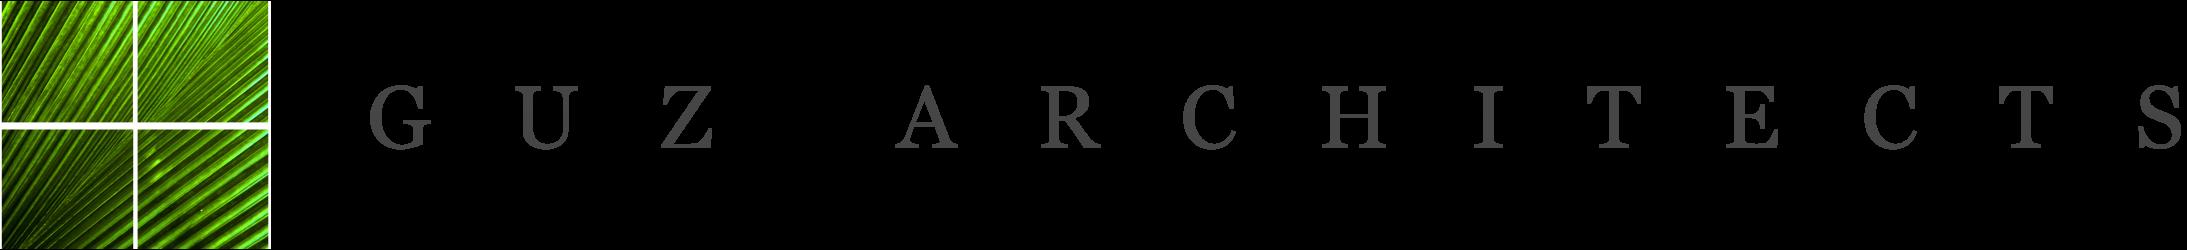 cropped-guz-logo-final.png